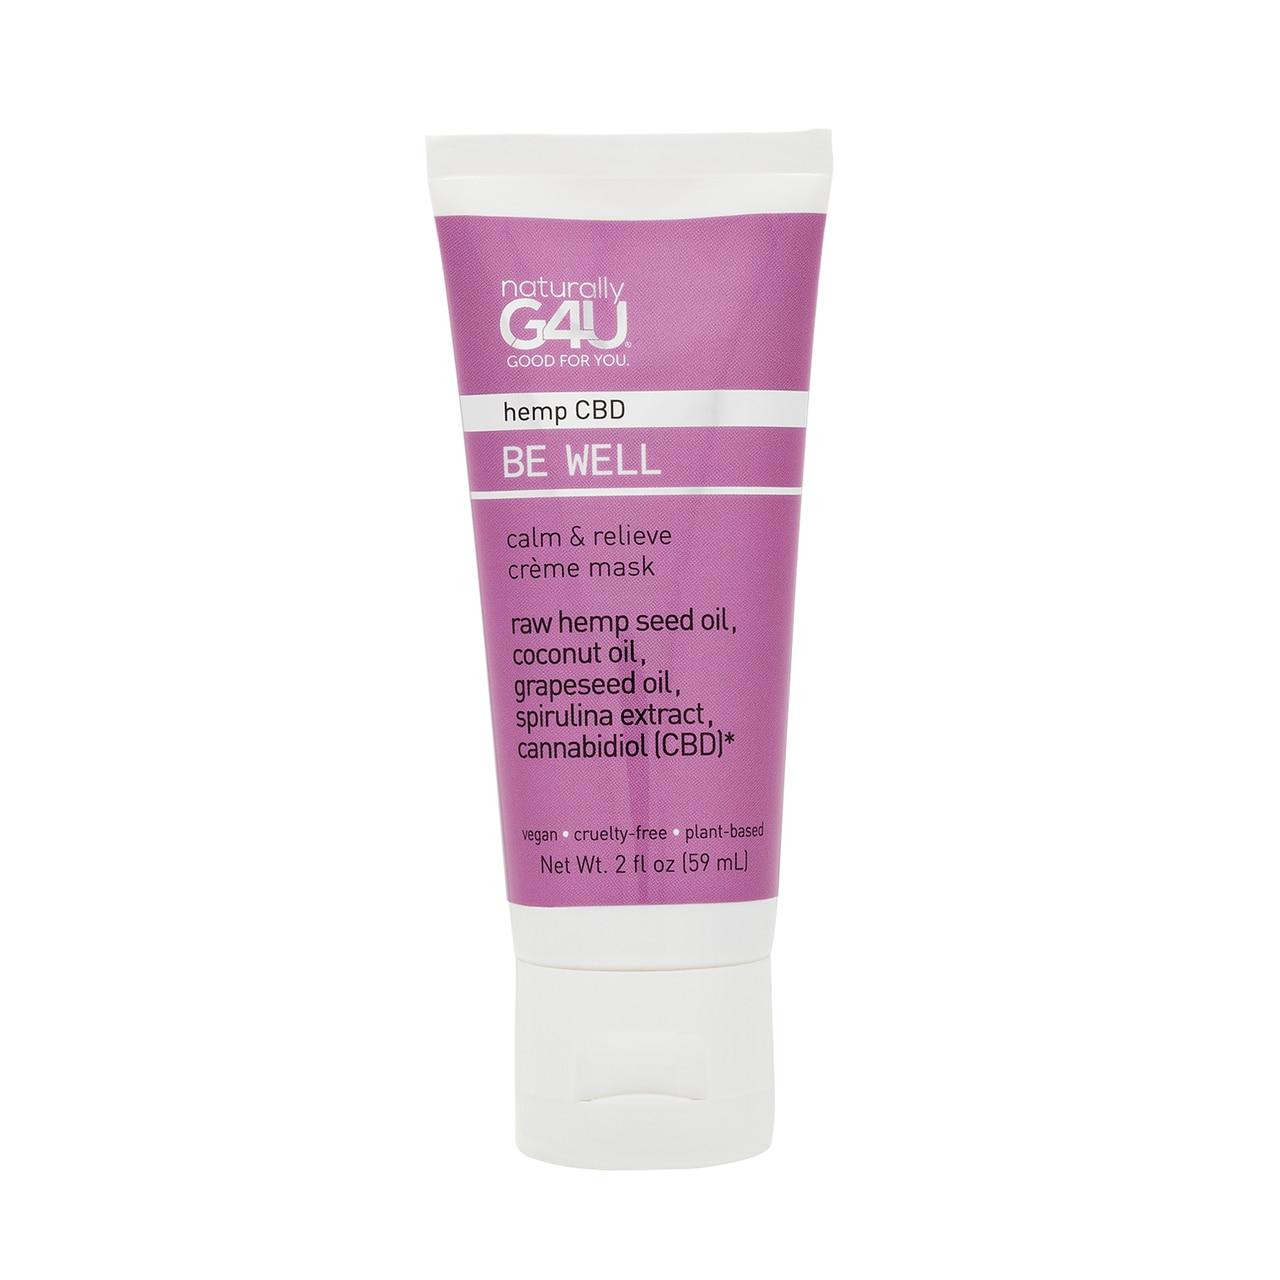 calm & relieve crème mask